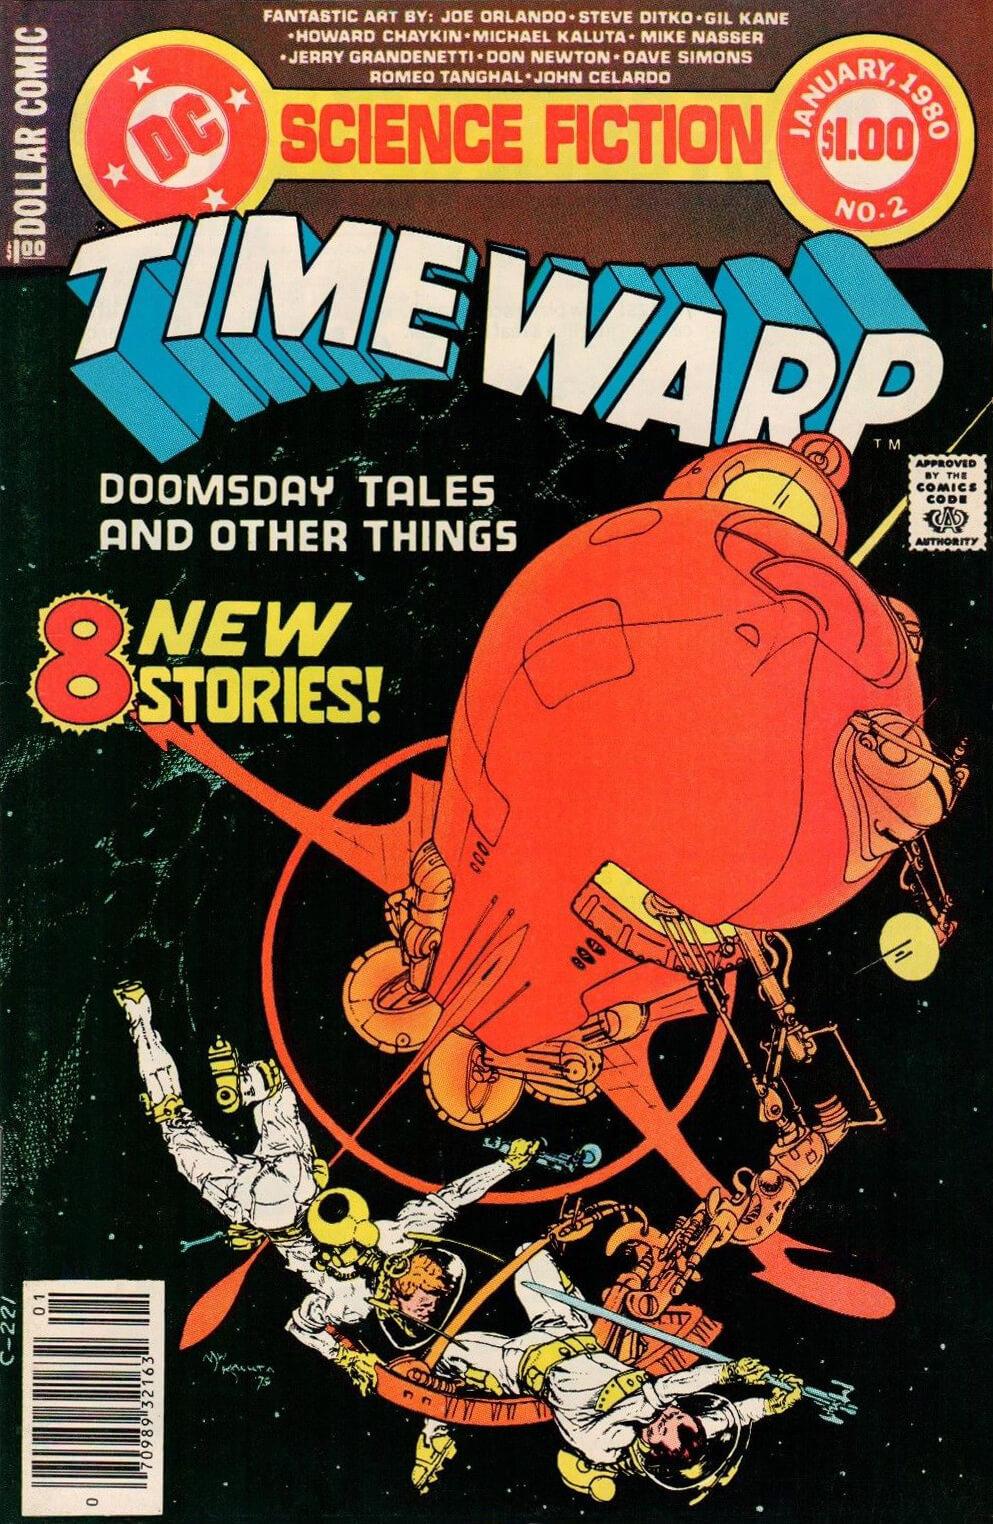 Time Warp 2 Cover by Michael Wm Kaluta